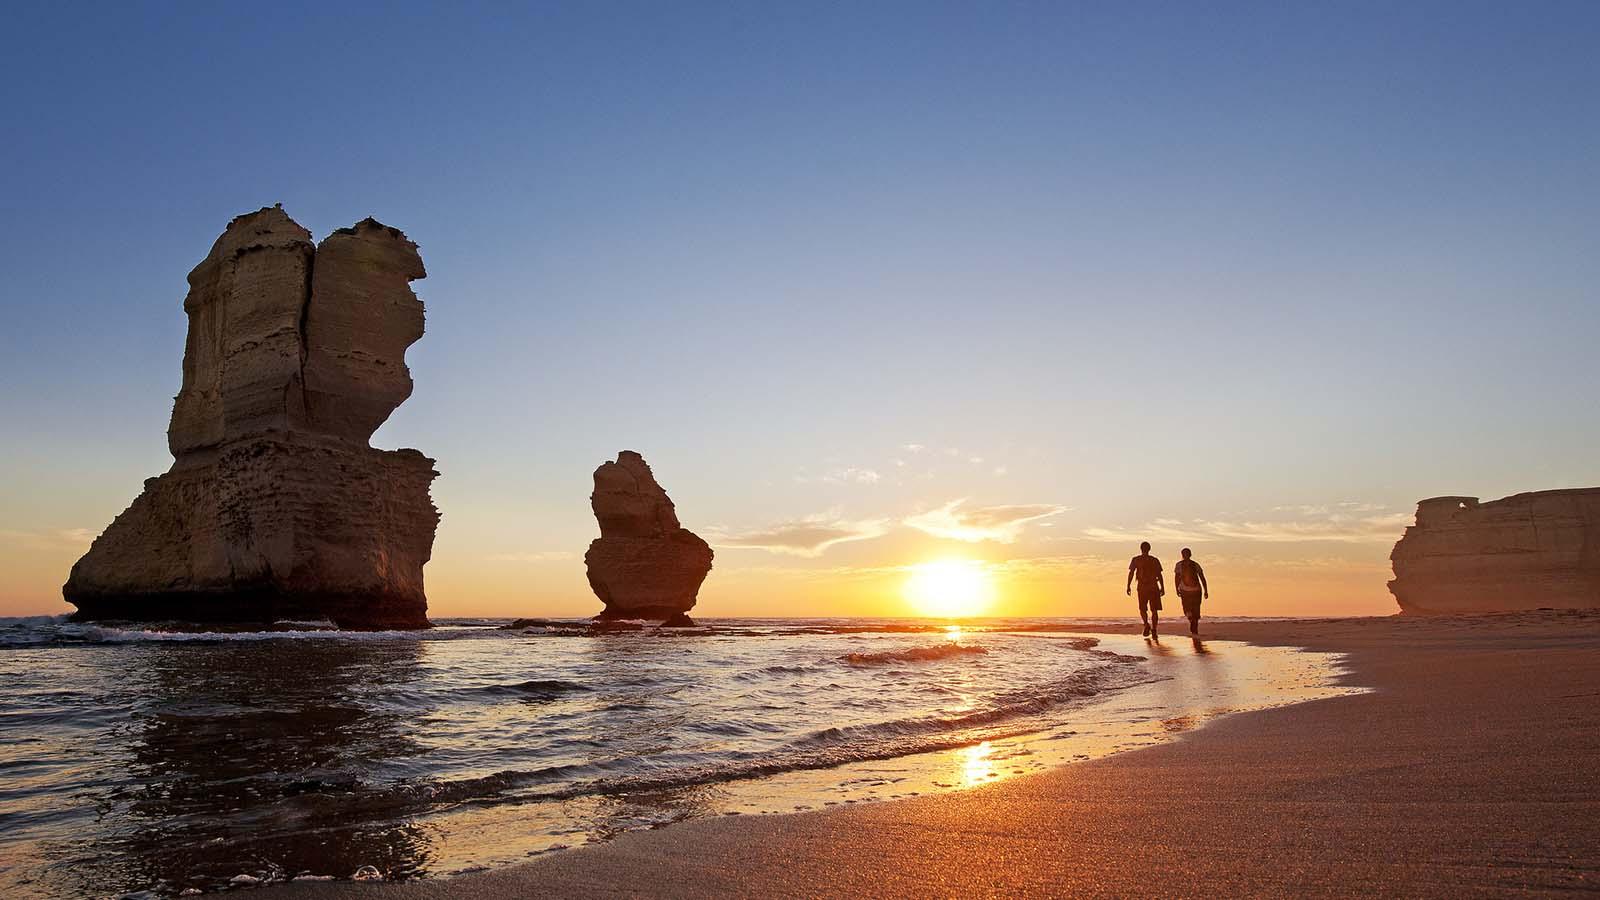 Sunset at the 12 Apostles, Great Ocean Road, Victoria, Australia